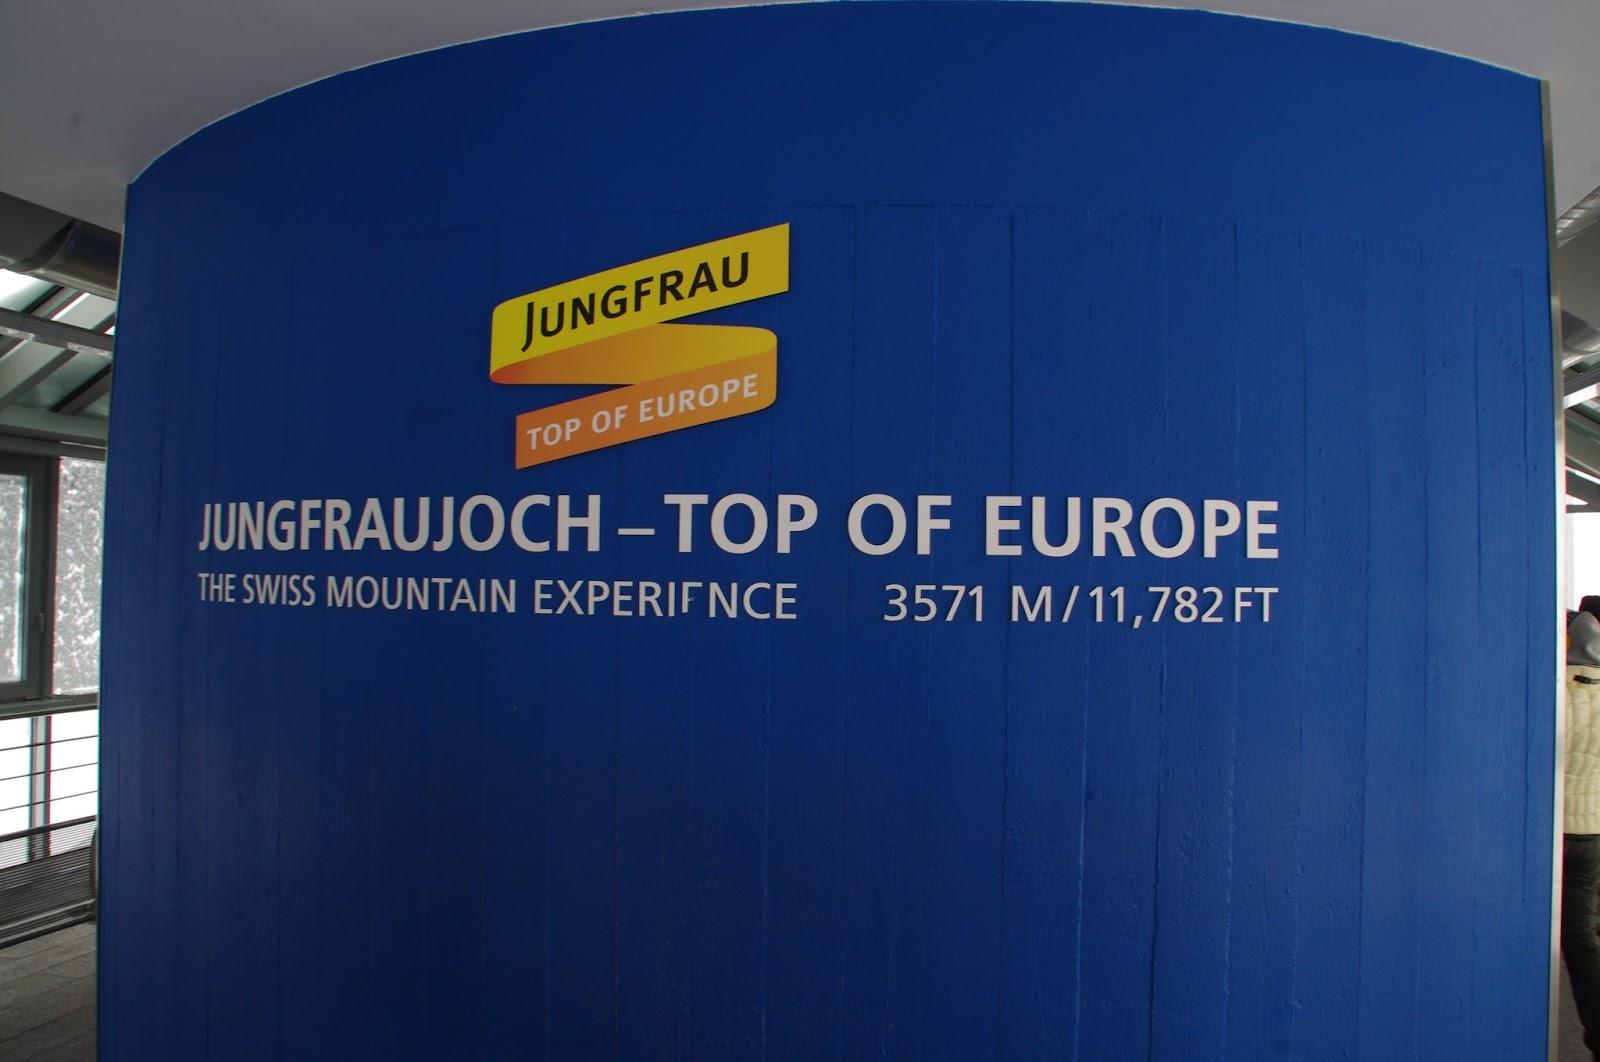 Jungfraujoch Top of Europe Sign